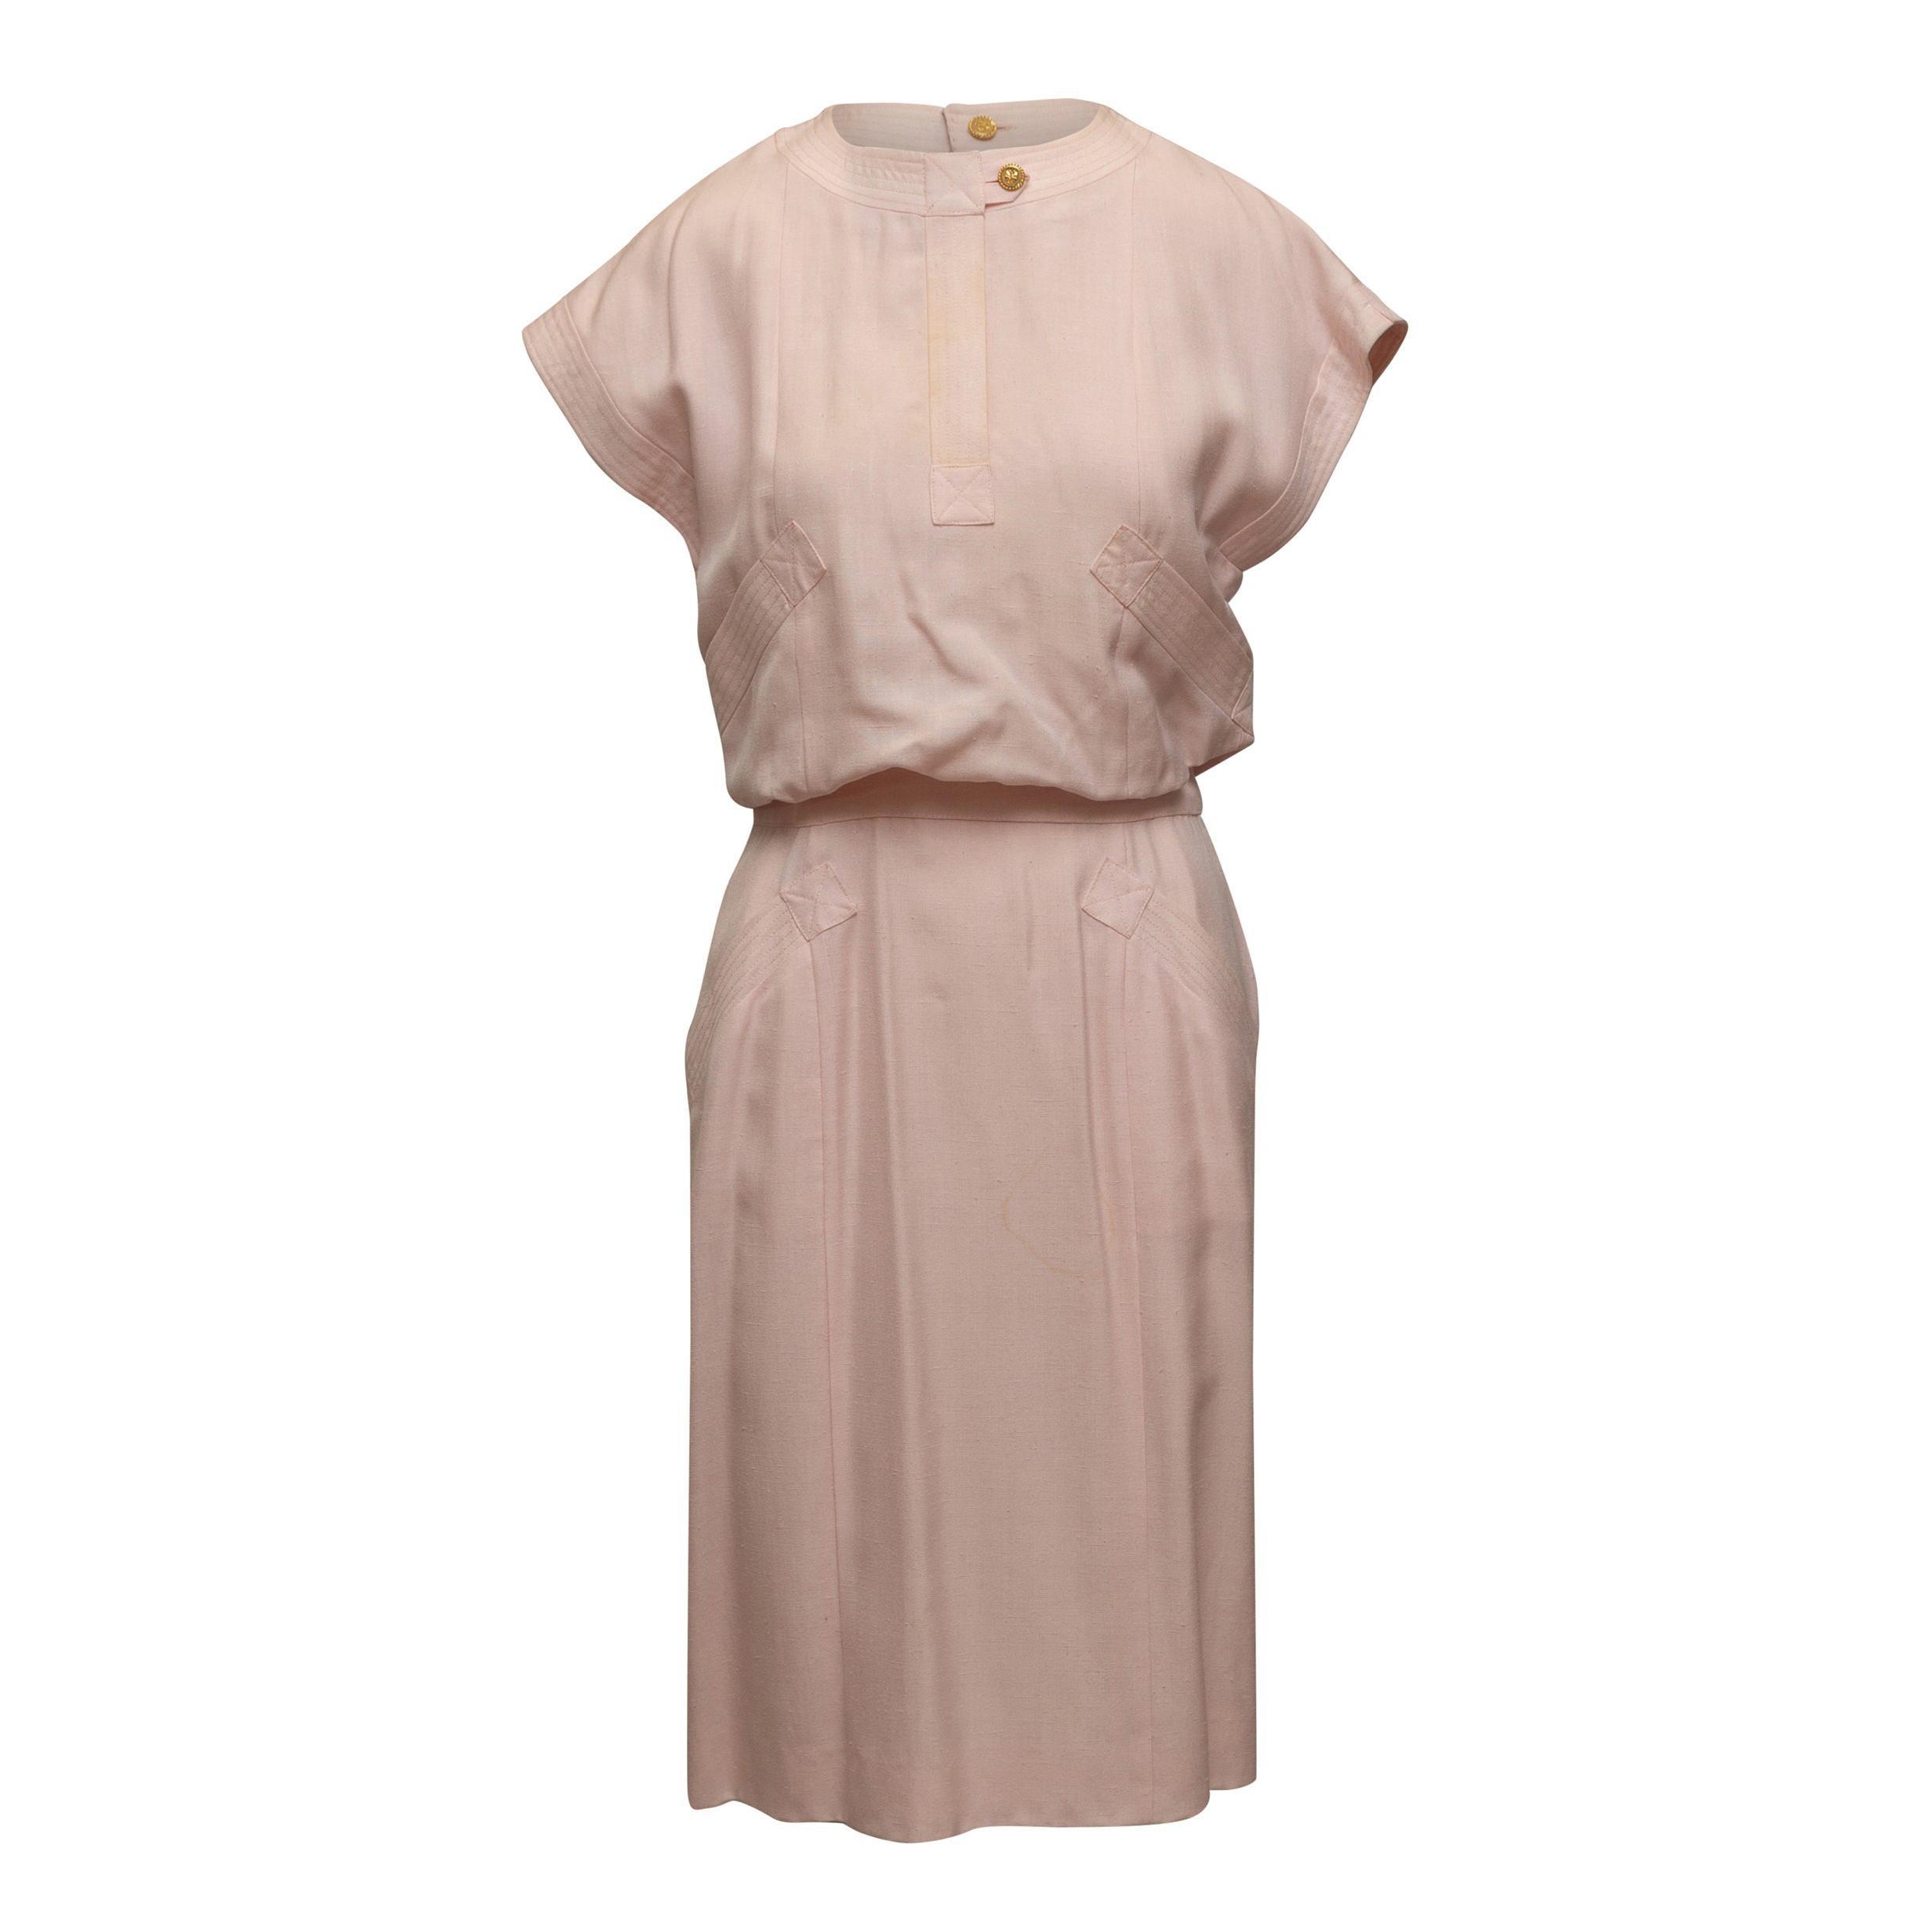 Chanel Boutique Light Pink Short Sleeve Dress